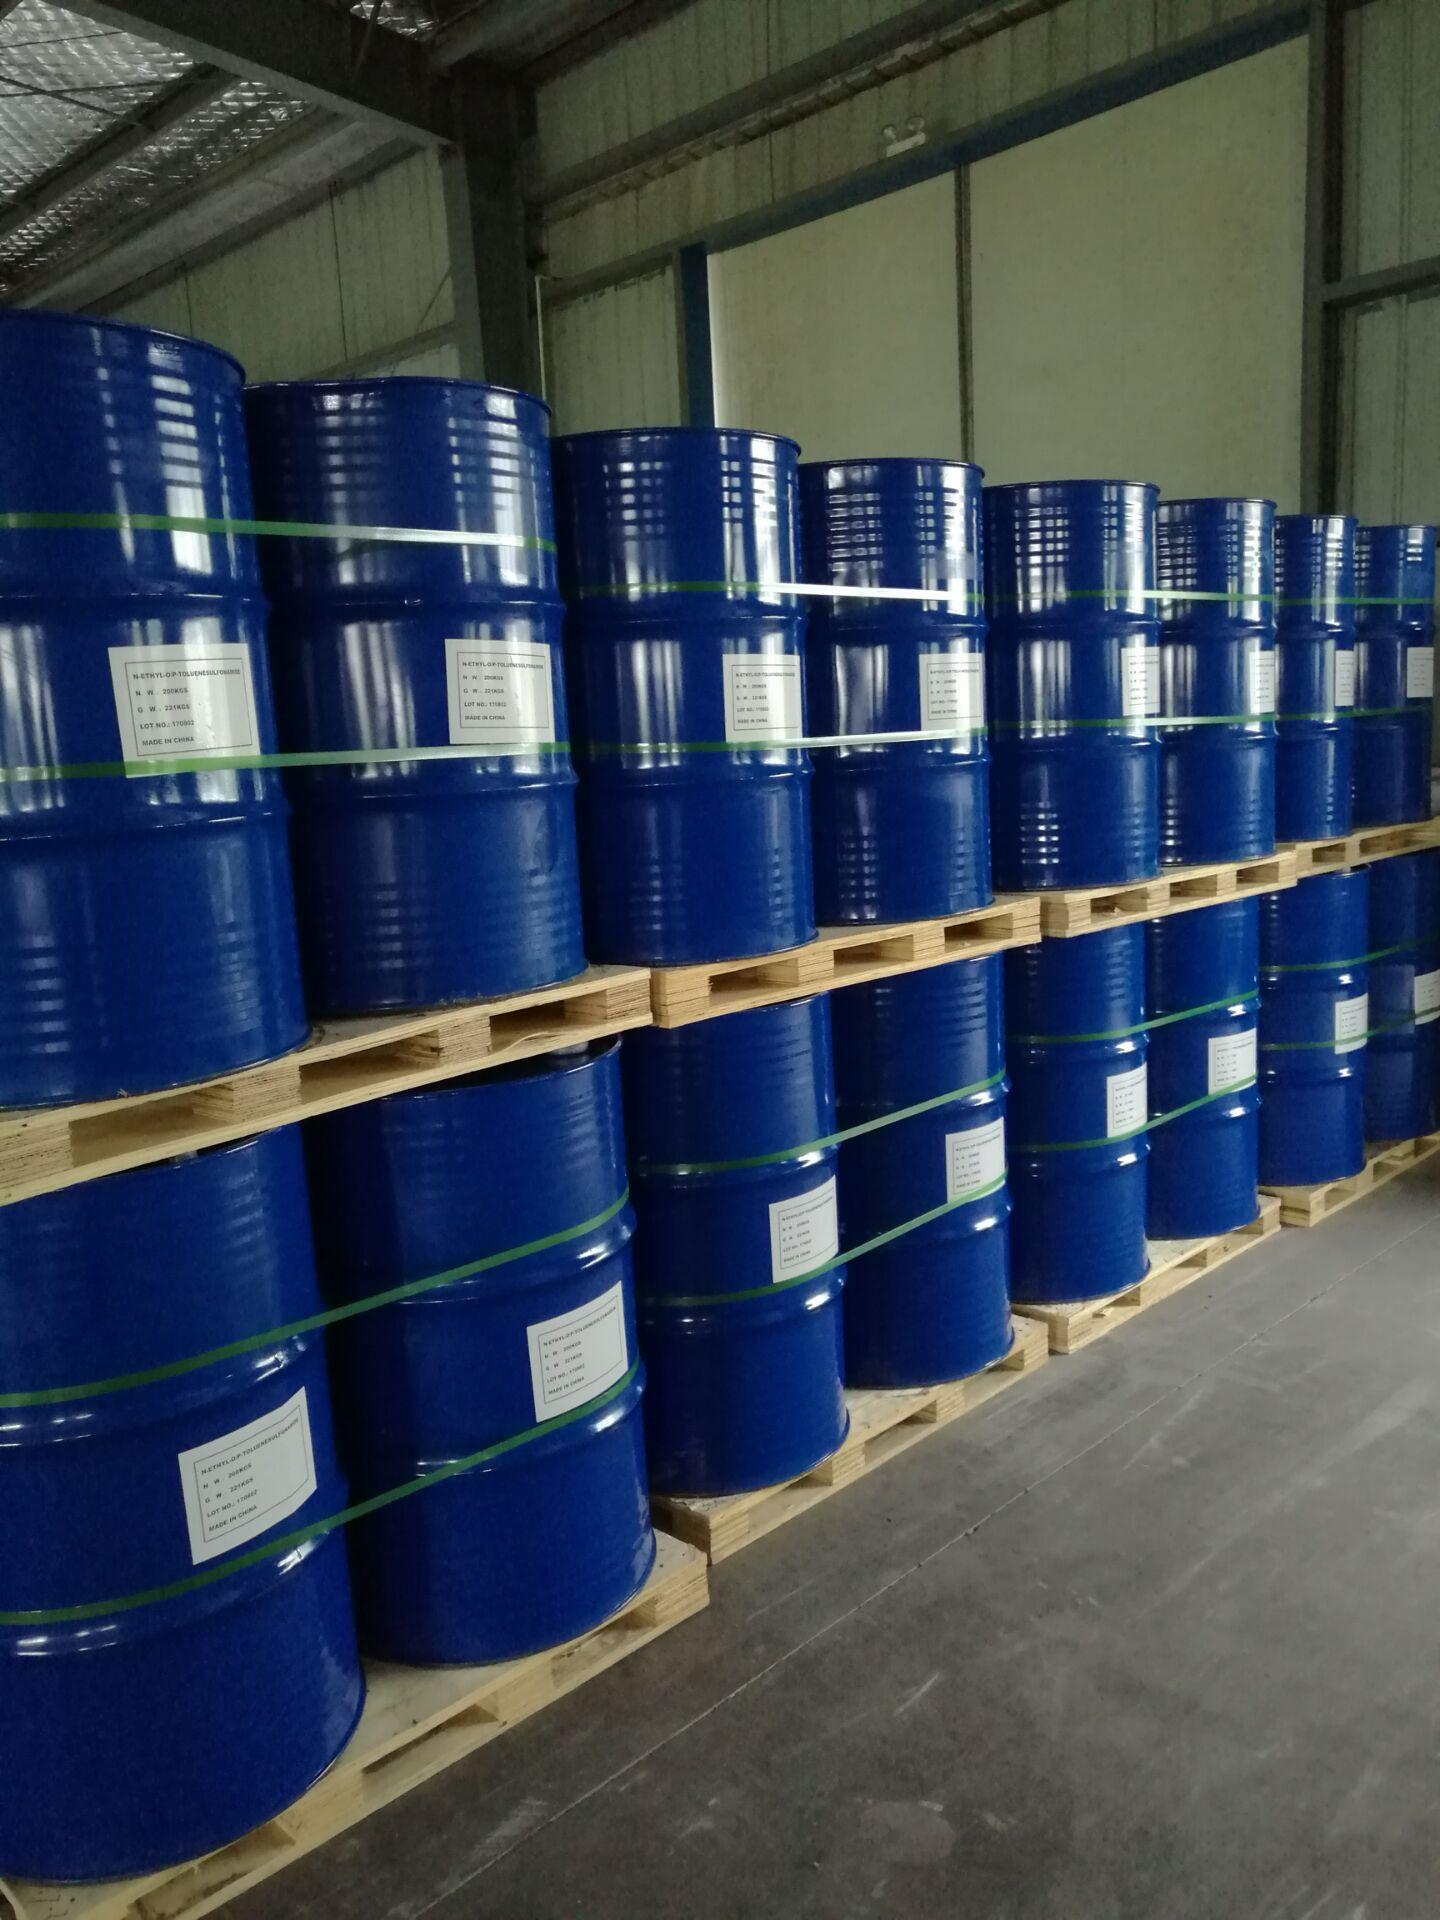 Toluenesulfonamide Formaldehyde Resin In Butyl Acetate (MS-80)